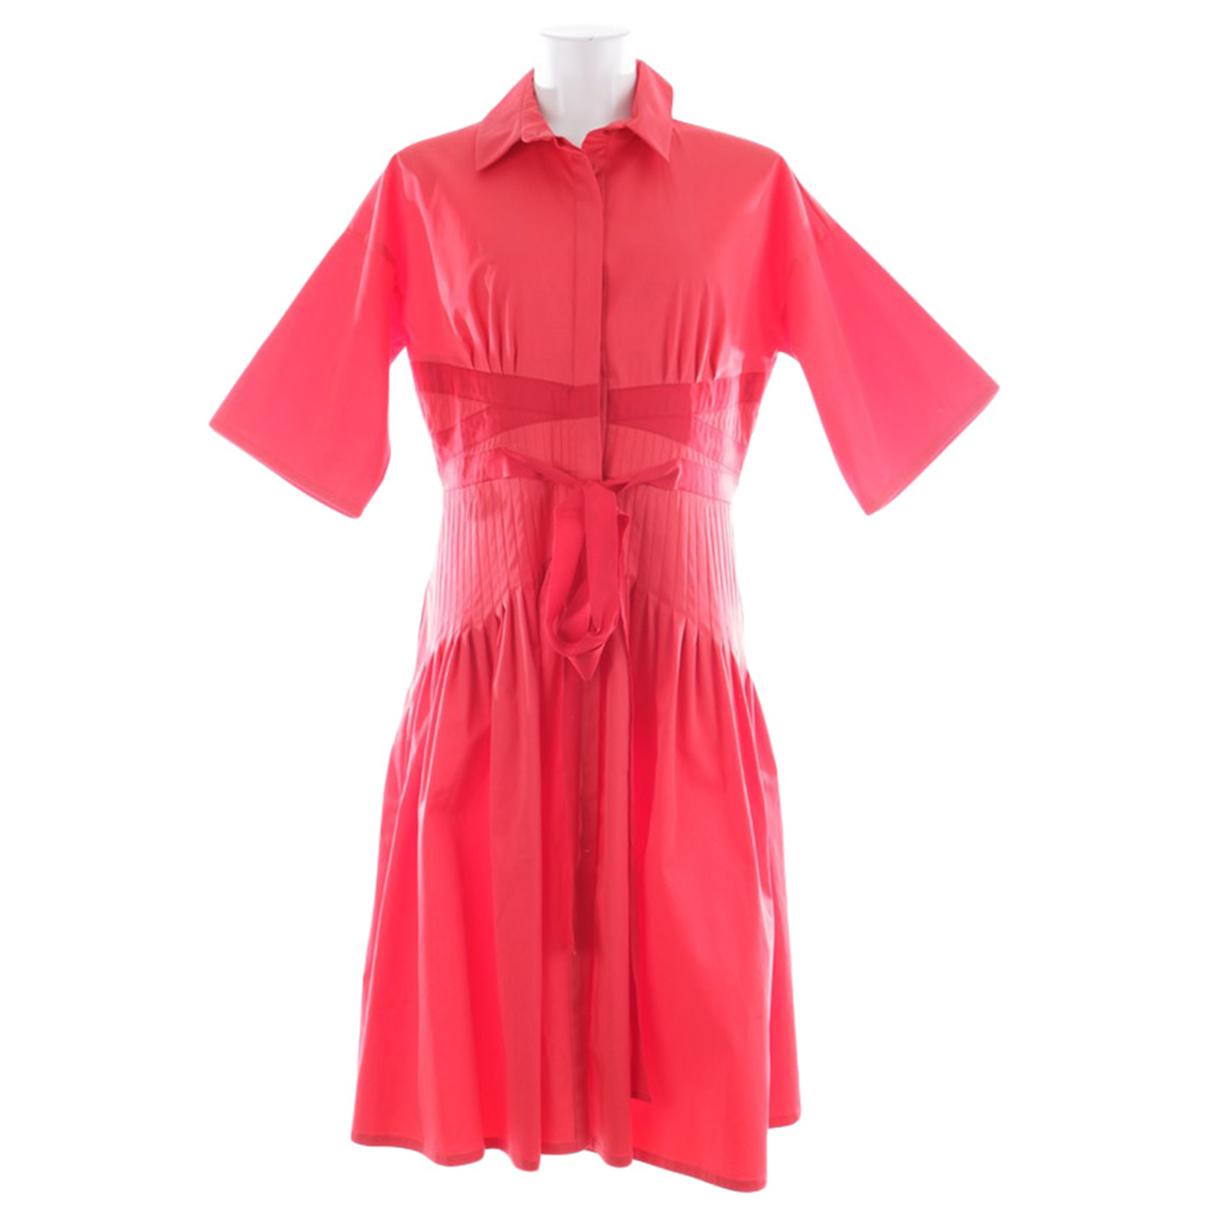 Carolina Herrera \N Red Cotton dress for Women 42 FR